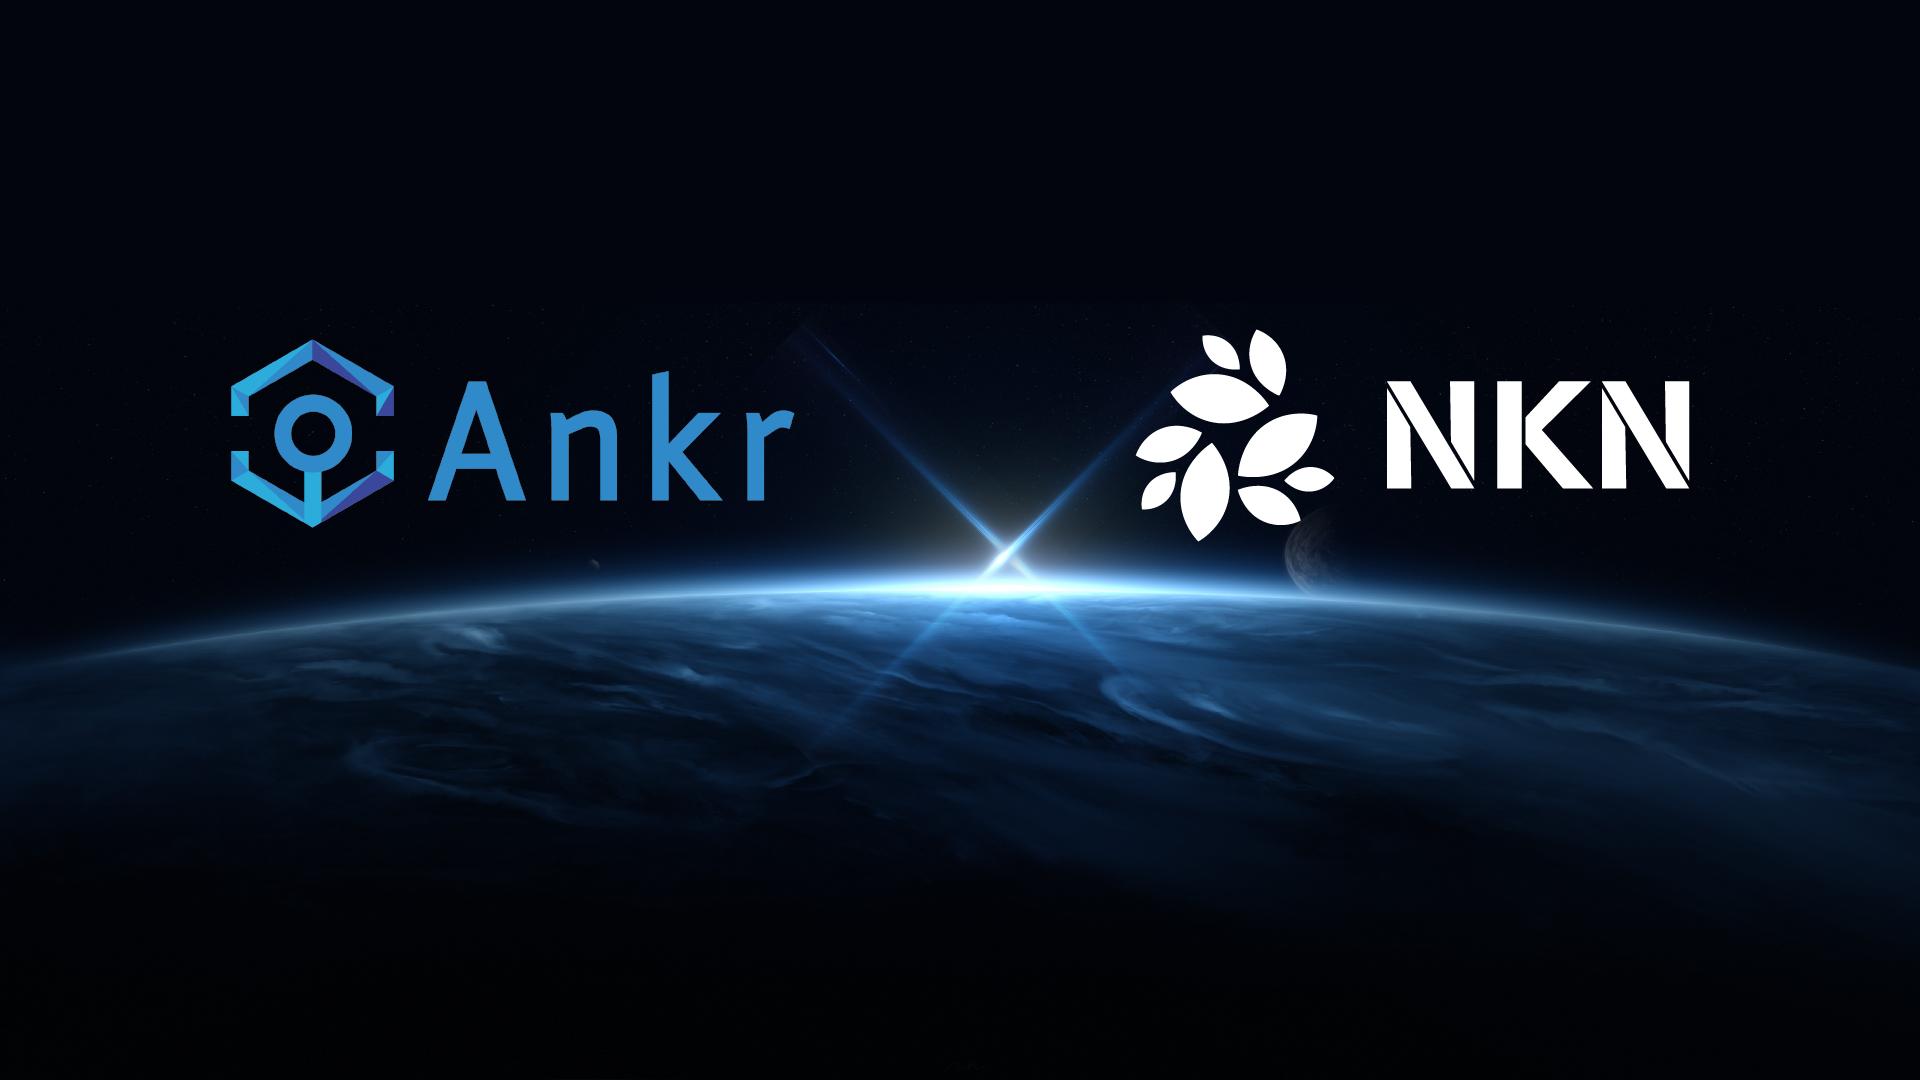 Ankr-NKN2